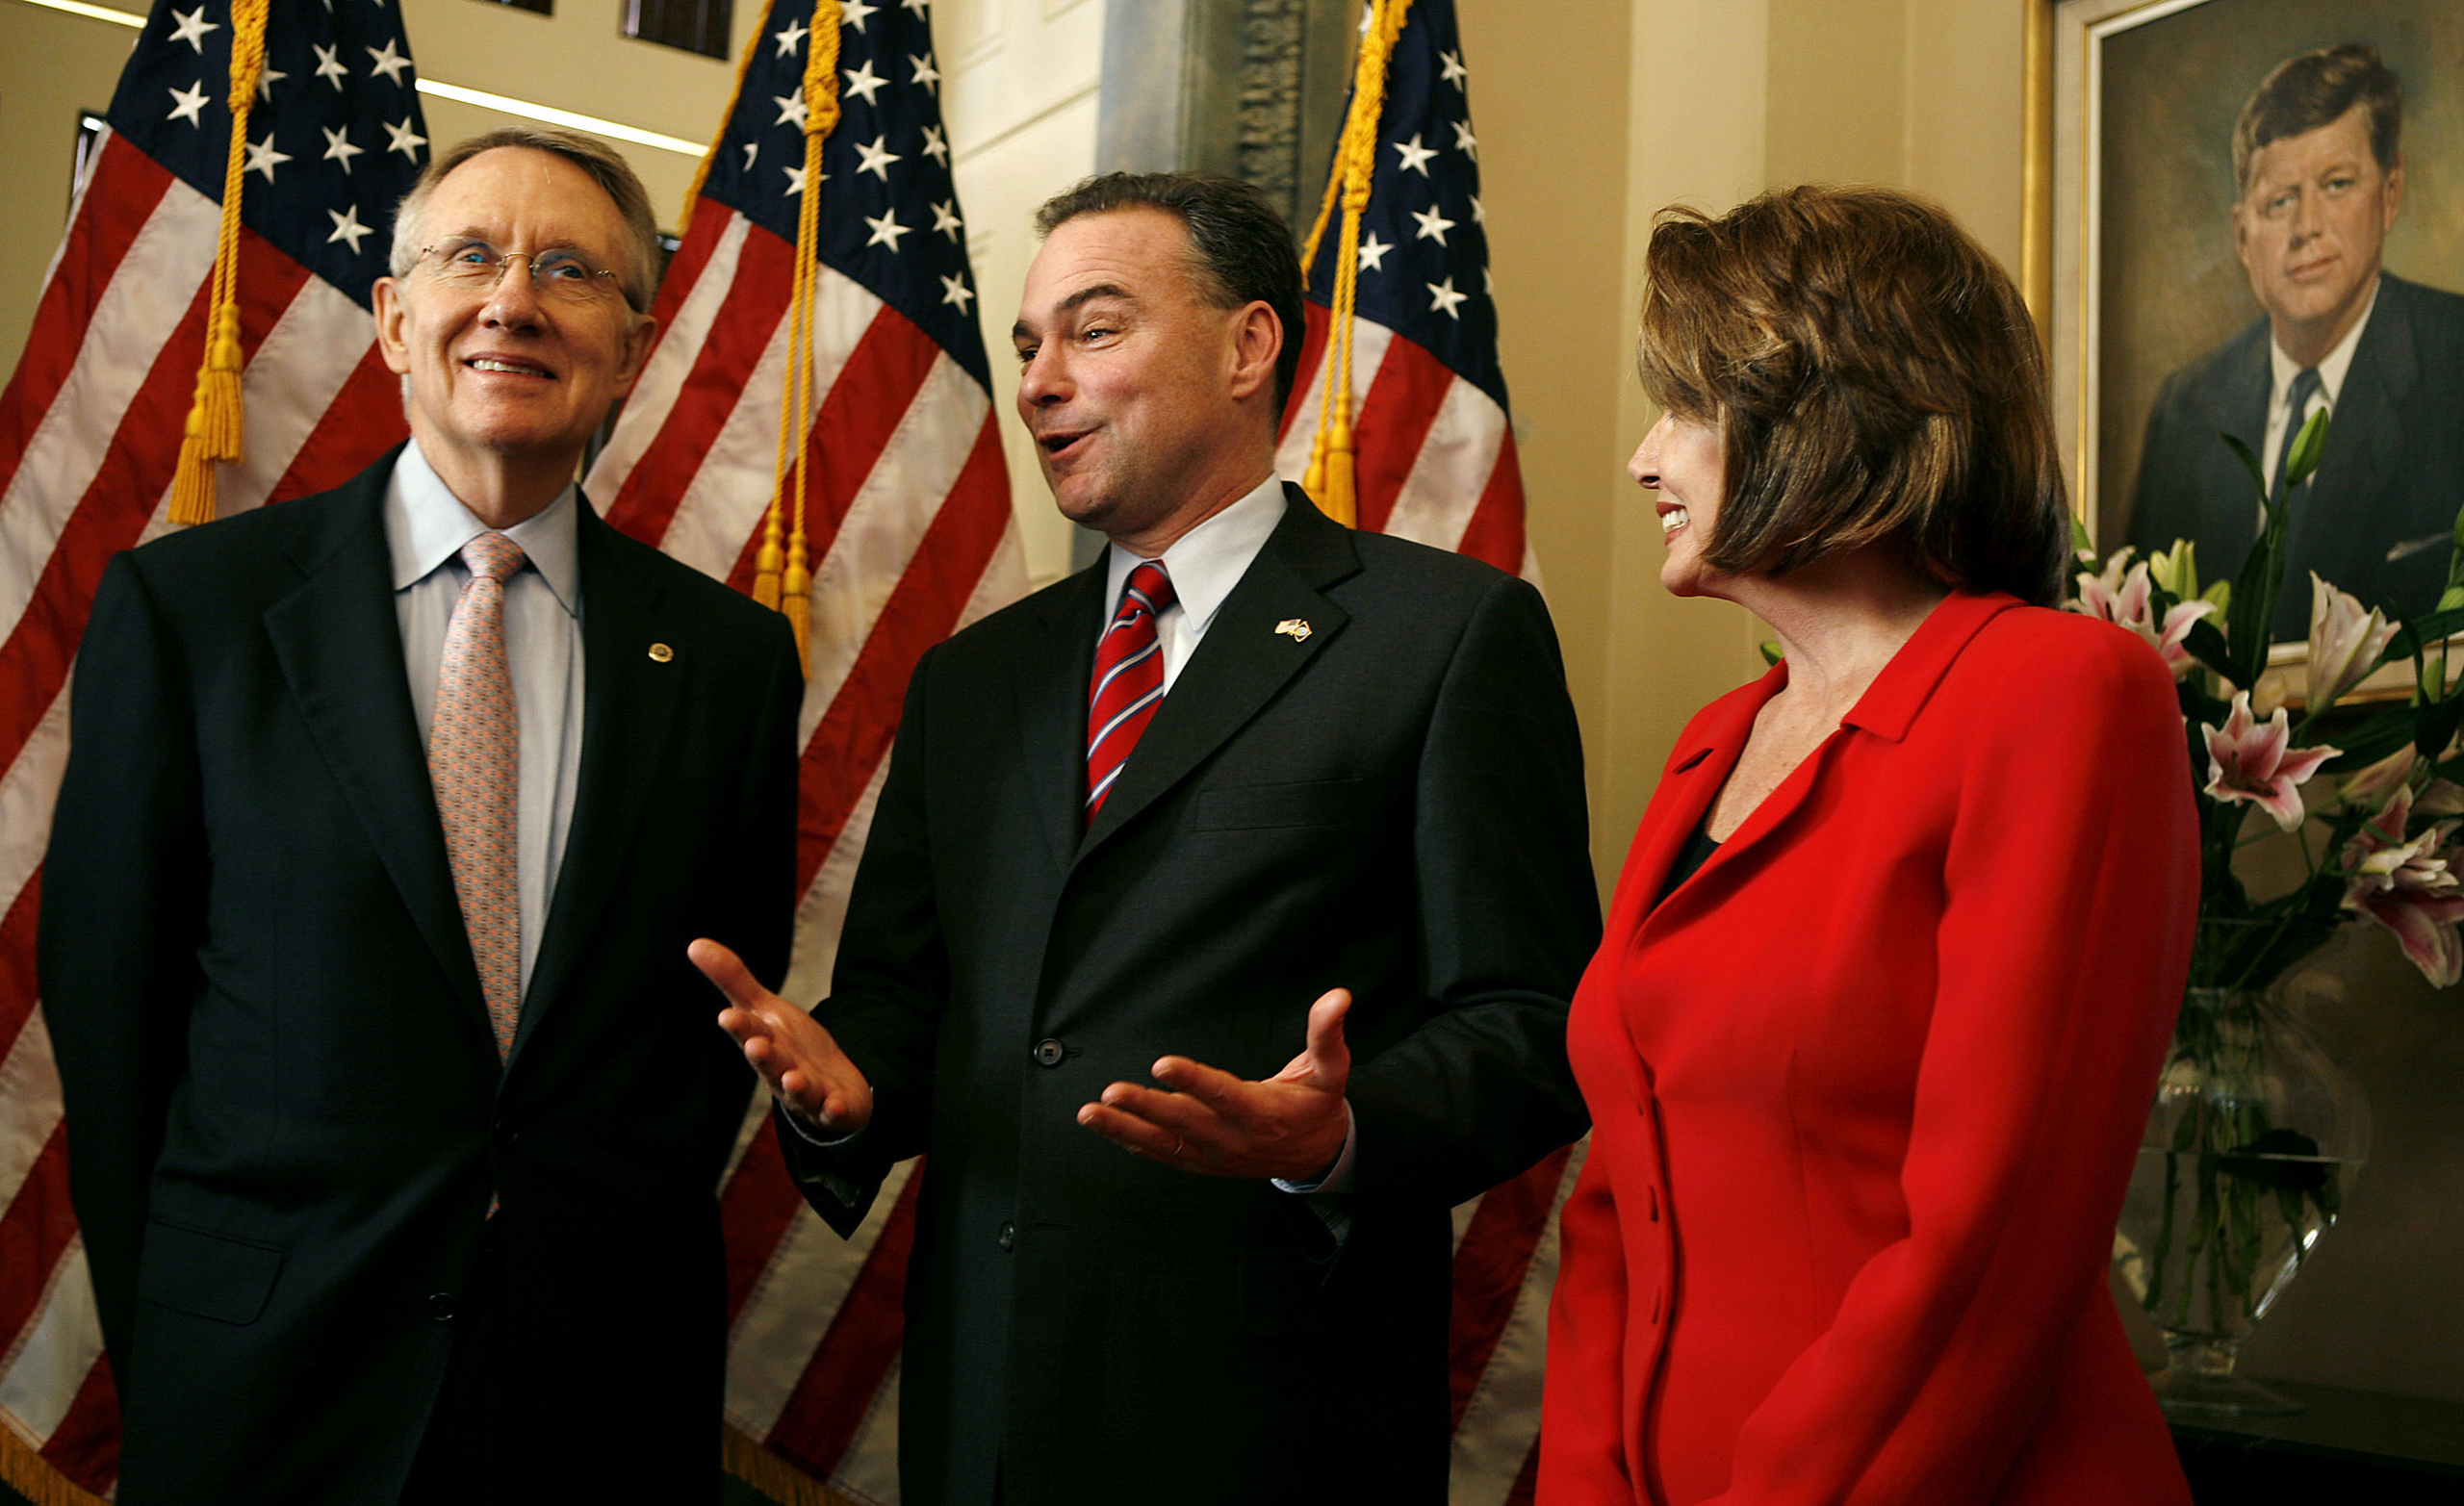 Senate Minority Leader Harry Reid left, Virginia Governor Tim Kaine center and House Minority Leader Nancy Pelosi pose for photographs on Capitol Hill in Washington on Jan. 31, 2006.